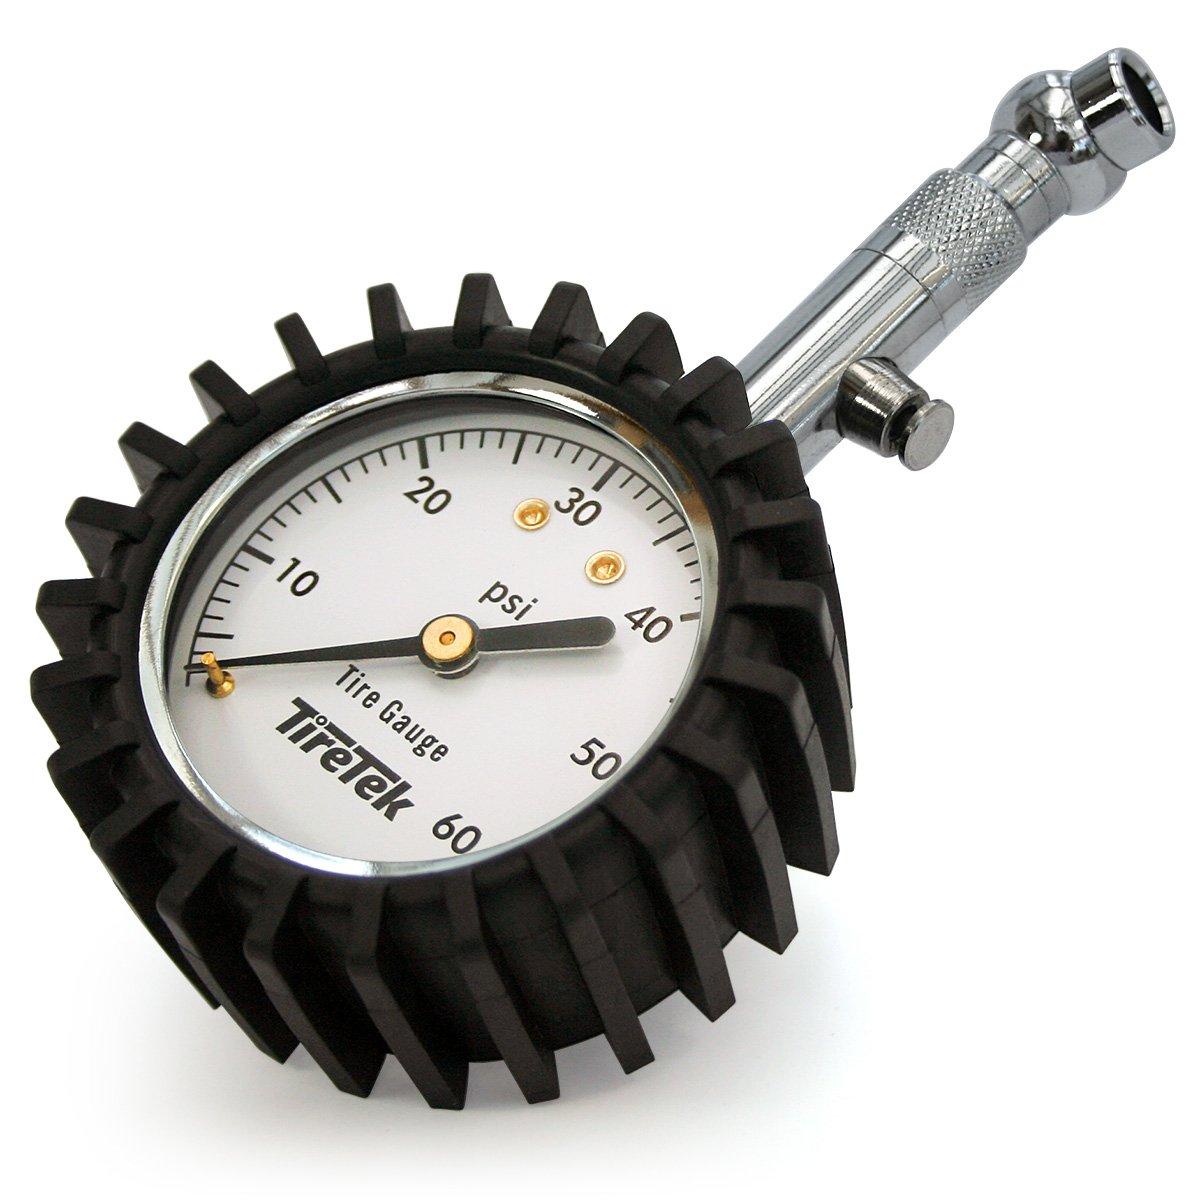 TireTek Premium Car Tire Pressure Gauge 60 PSI - Heavy Duty Tire Gauge ANSI Certified Accurate by TireTek